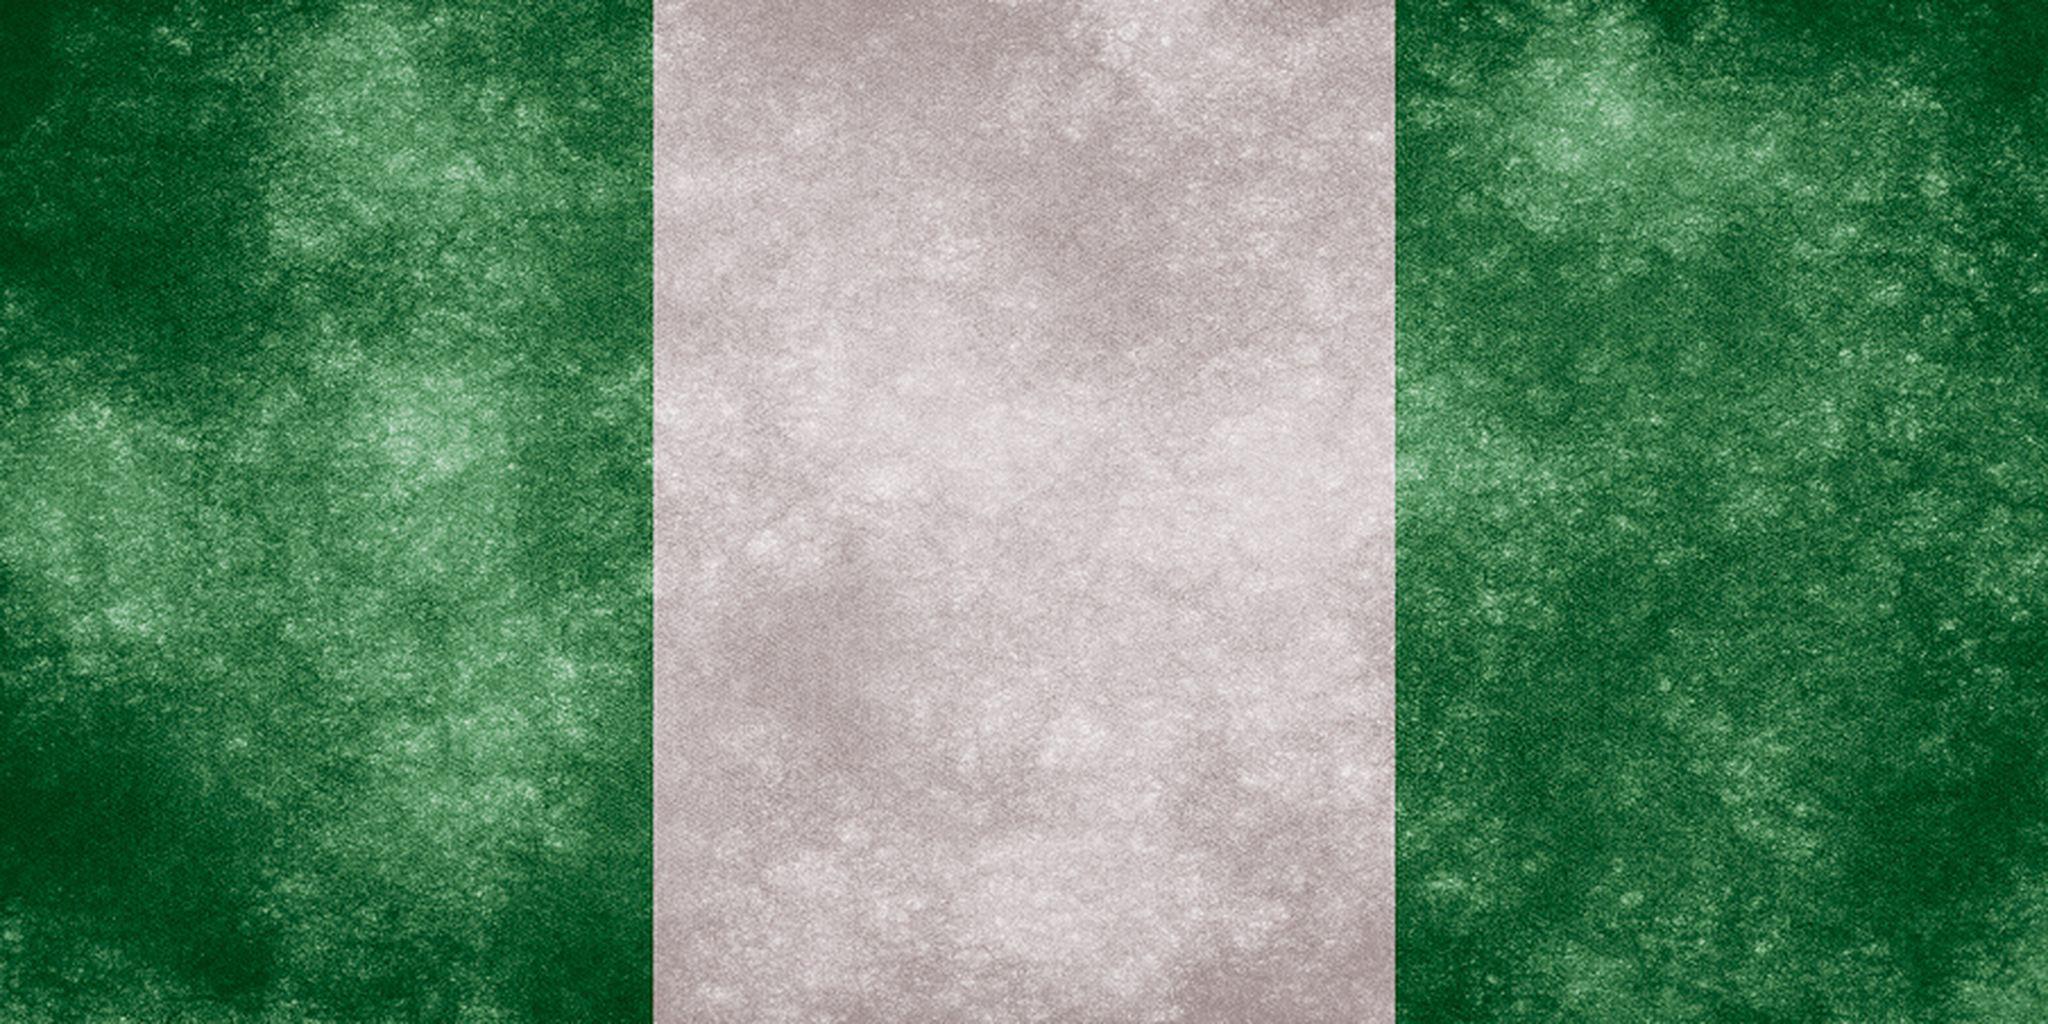 All sizes | Nigeria Grunge Flag | Flickr - Photo Sharing!